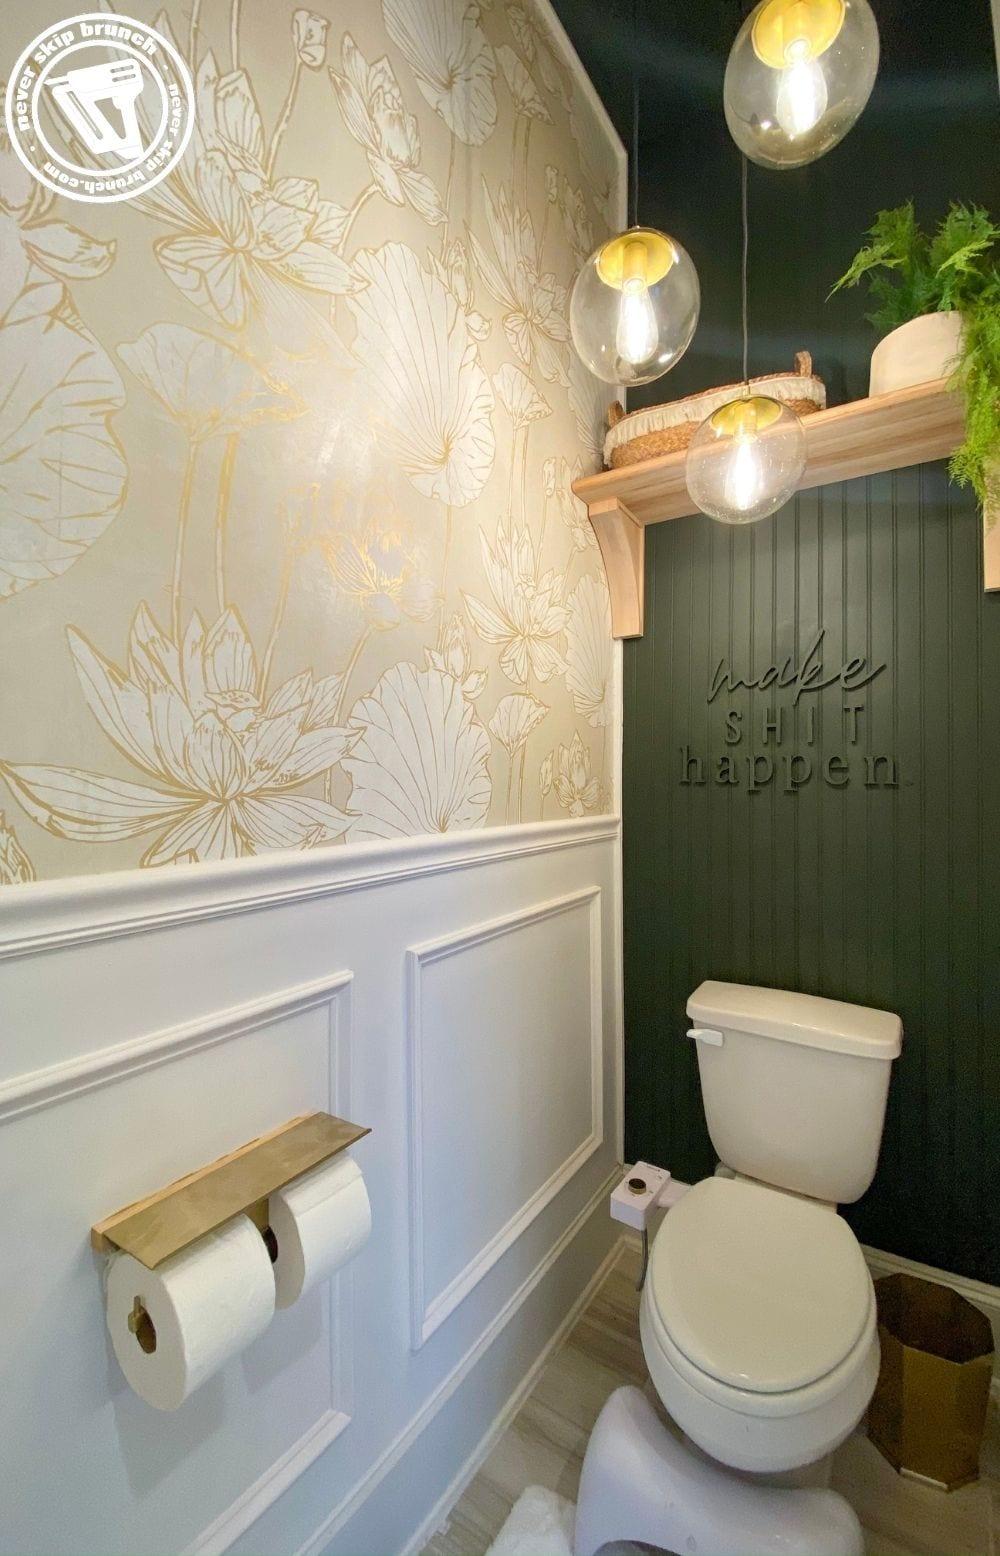 water closet makeover by top interior design blogger, Never Skip Brunch